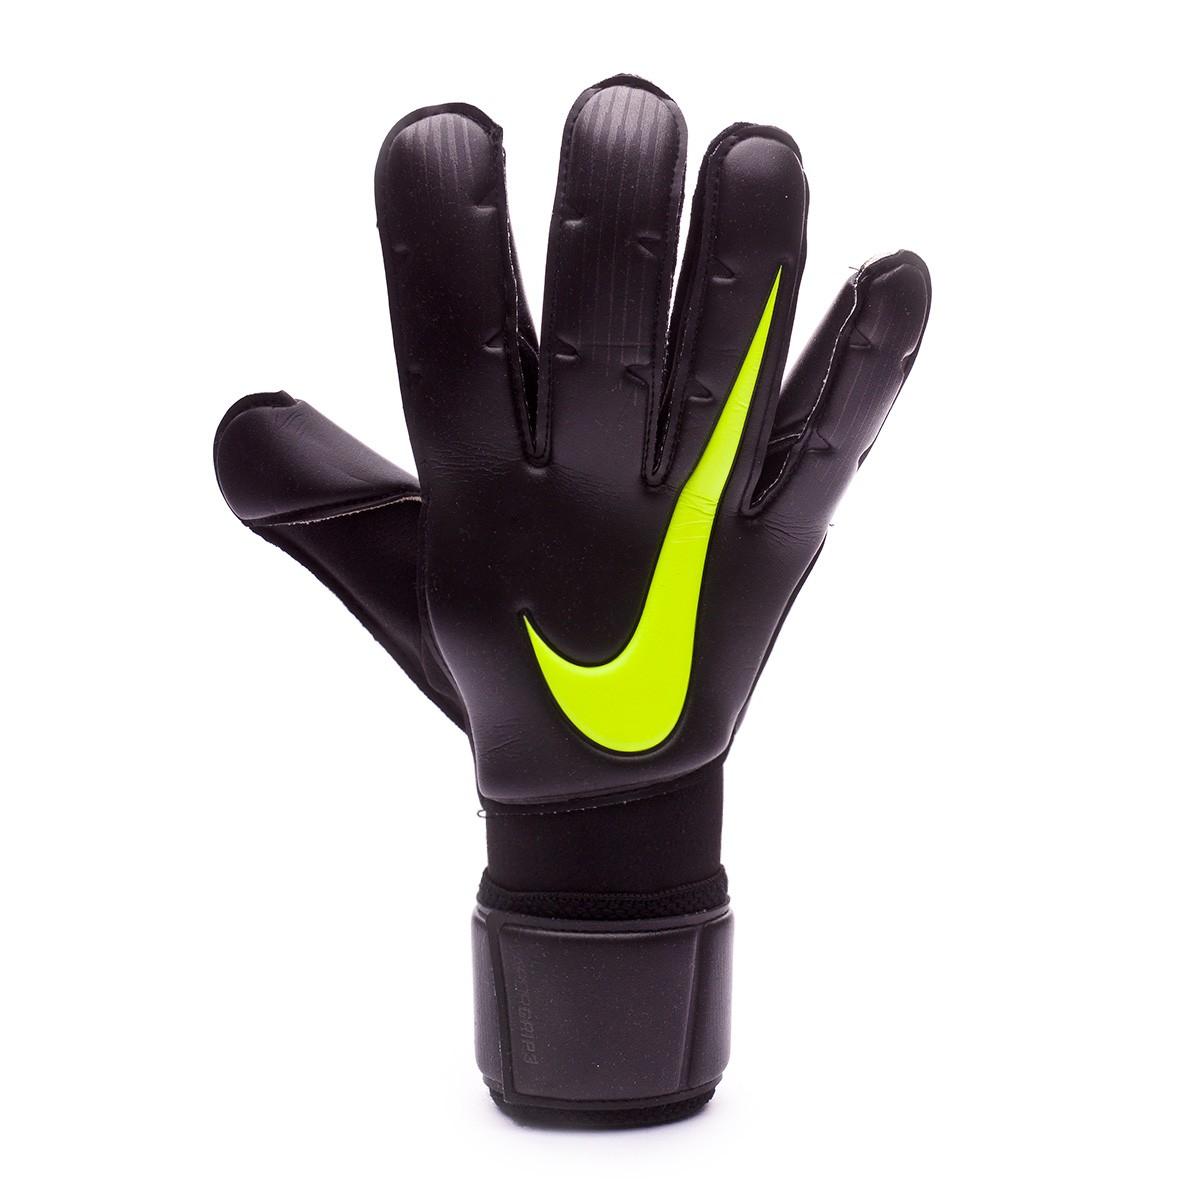 8c93ae3e497f0 Guante de portero Nike Vapor Grip 3 Black-Volt - Tienda de fútbol Fútbol  Emotion